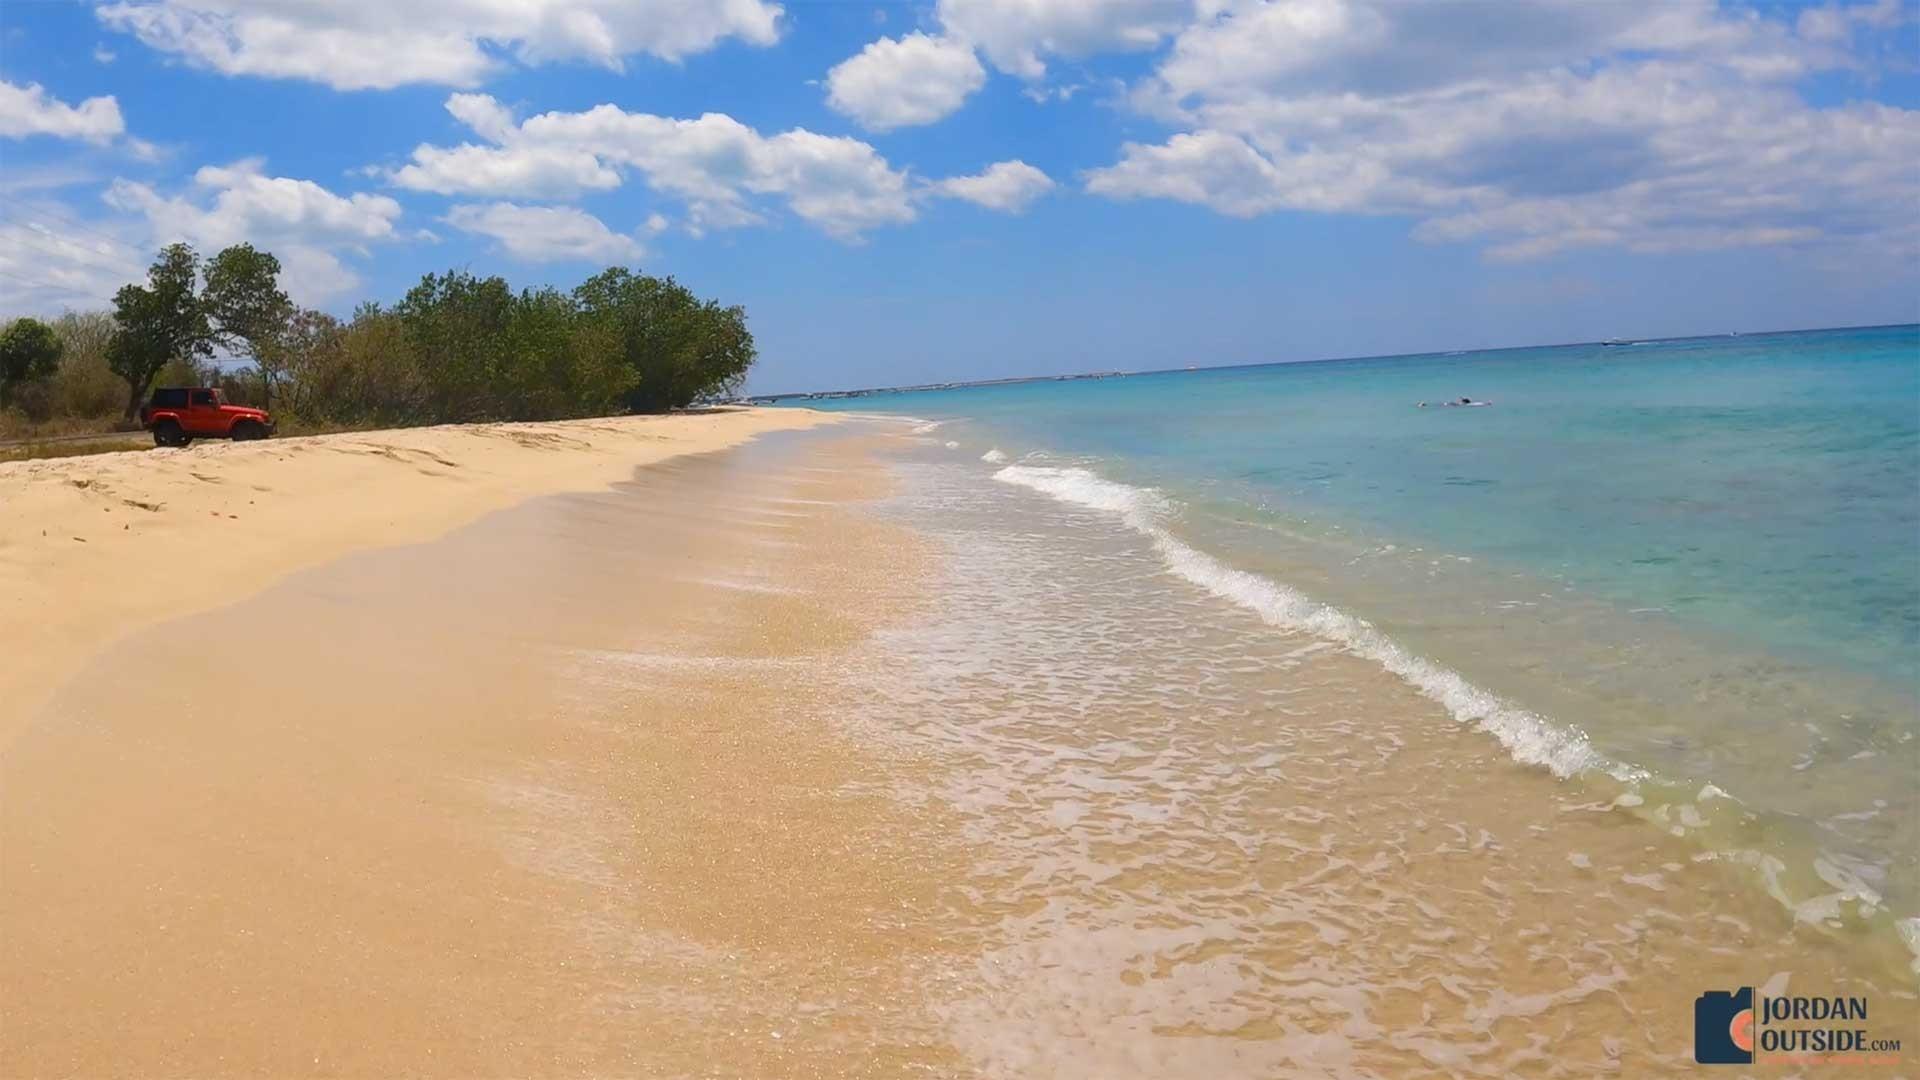 Soft sand on Sprat Hall Beach, St. Croix